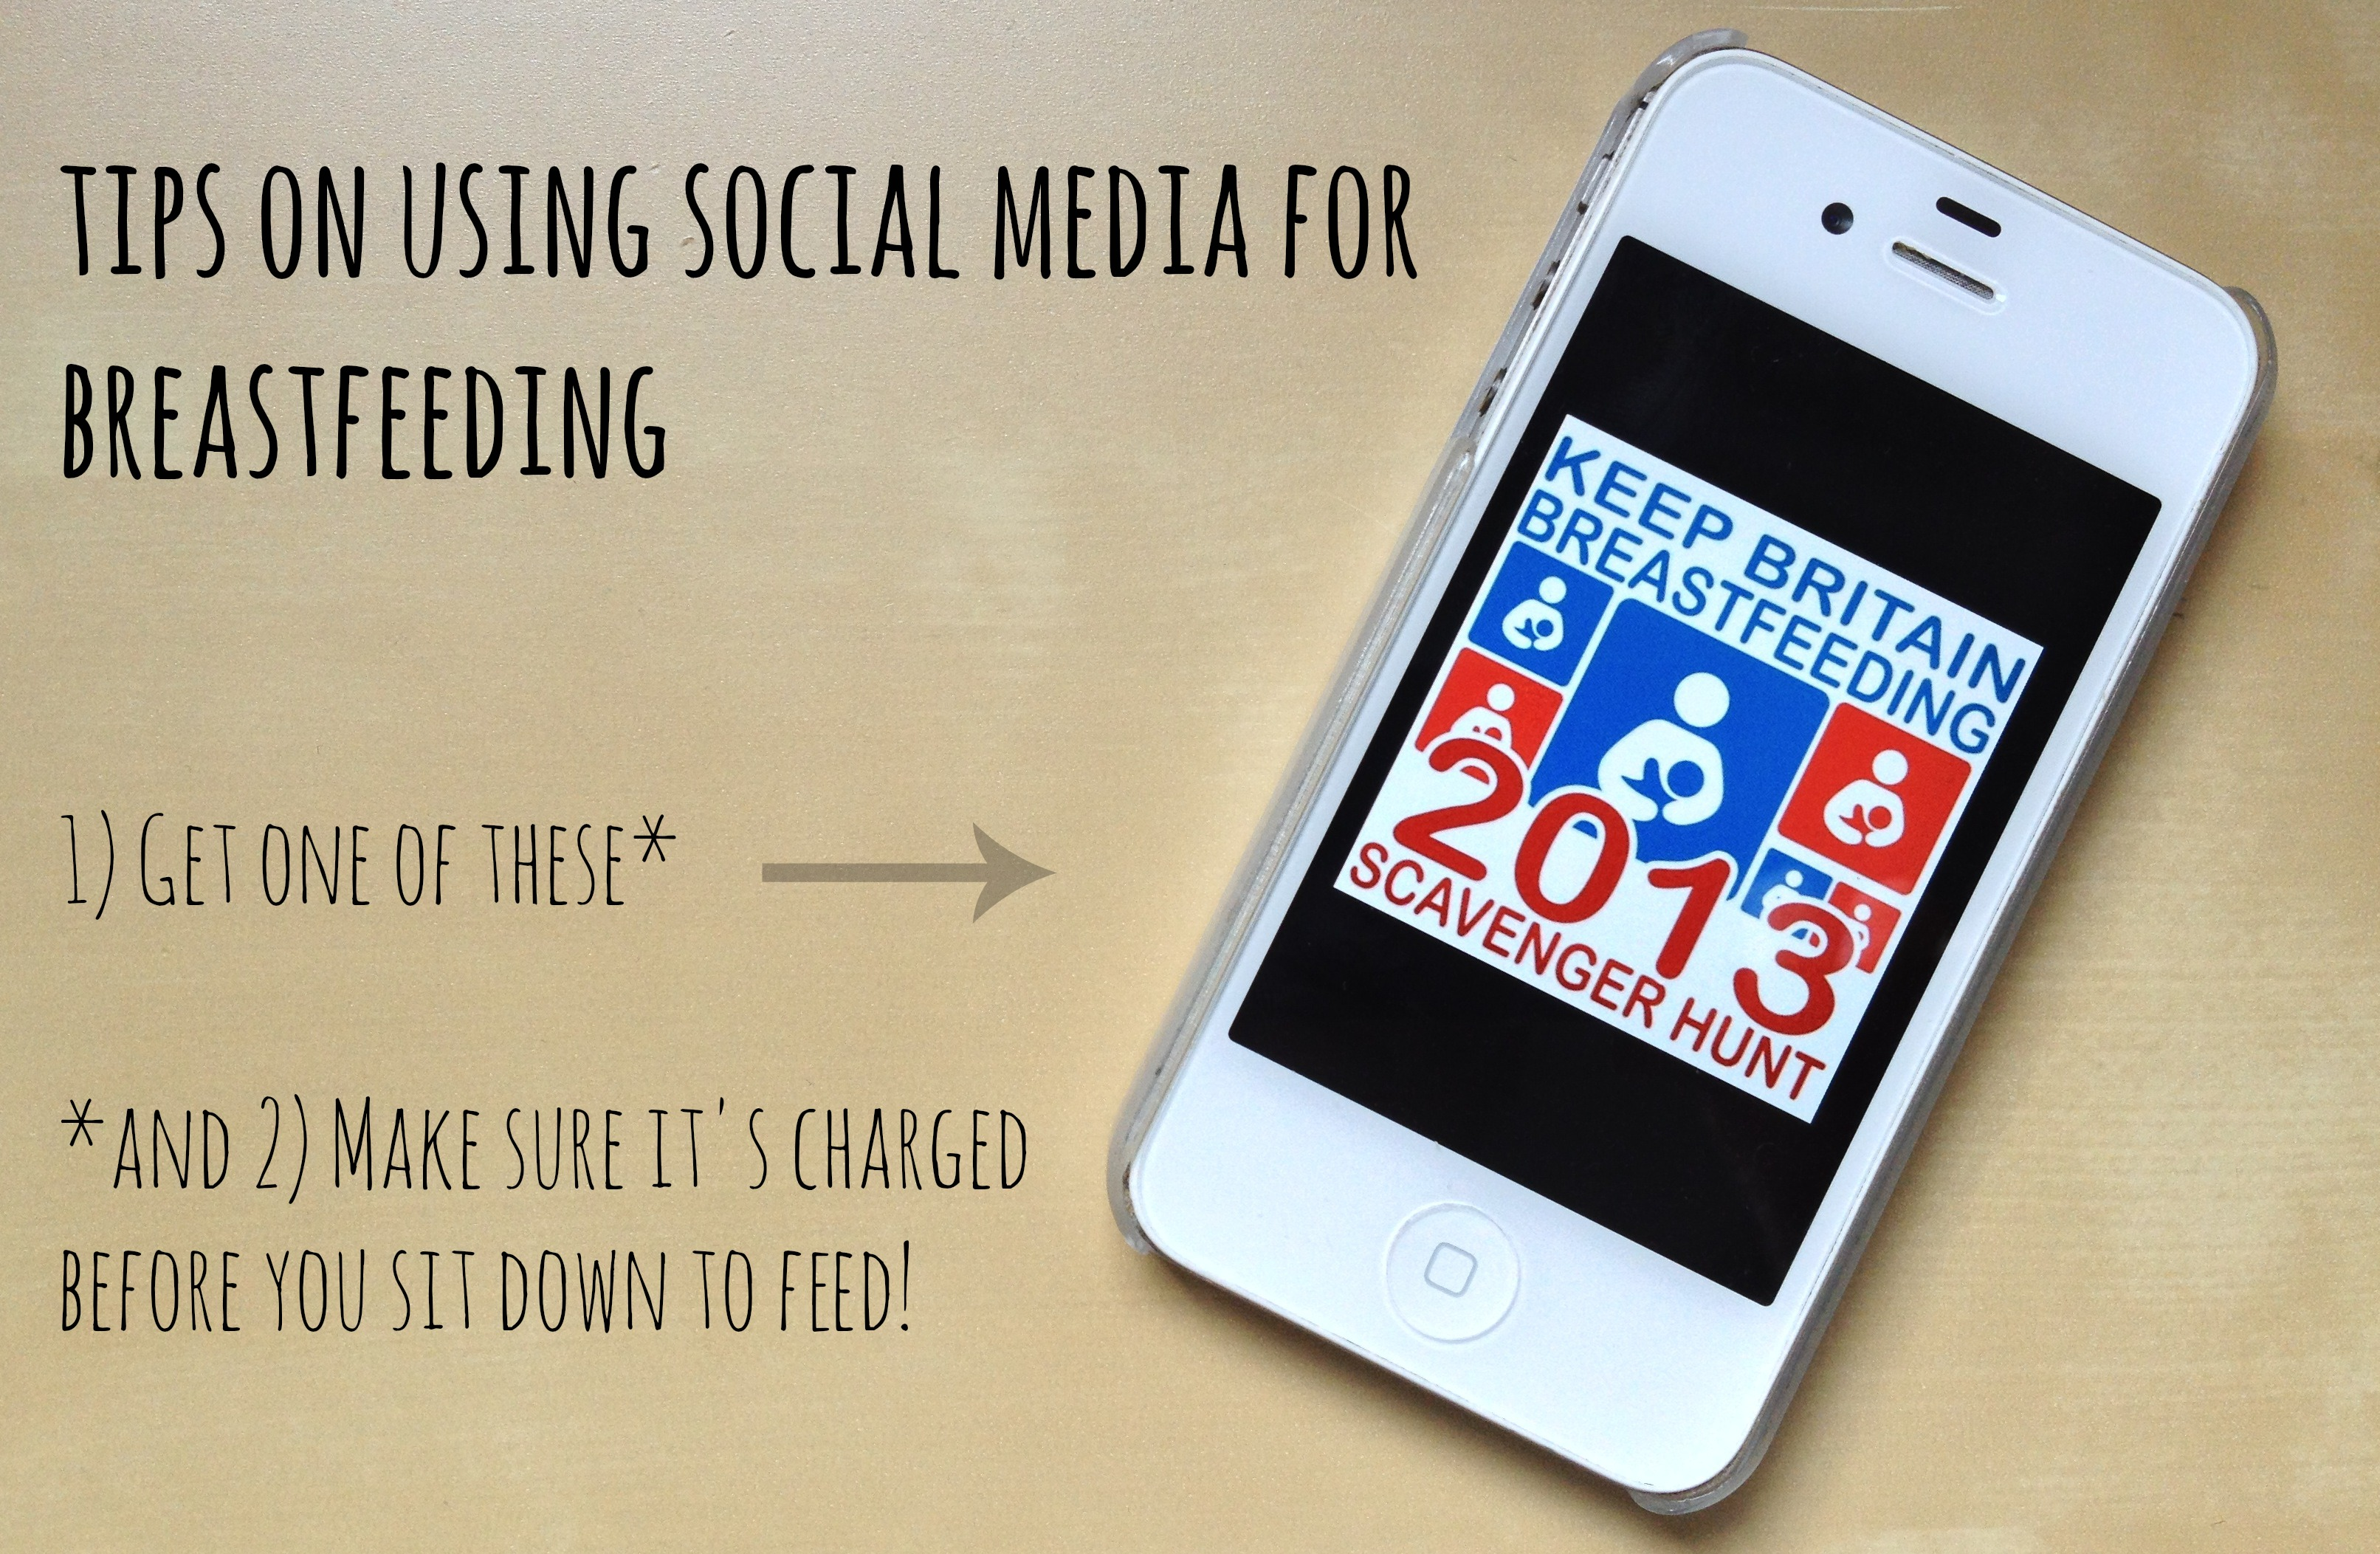 Social media and breastfeeding